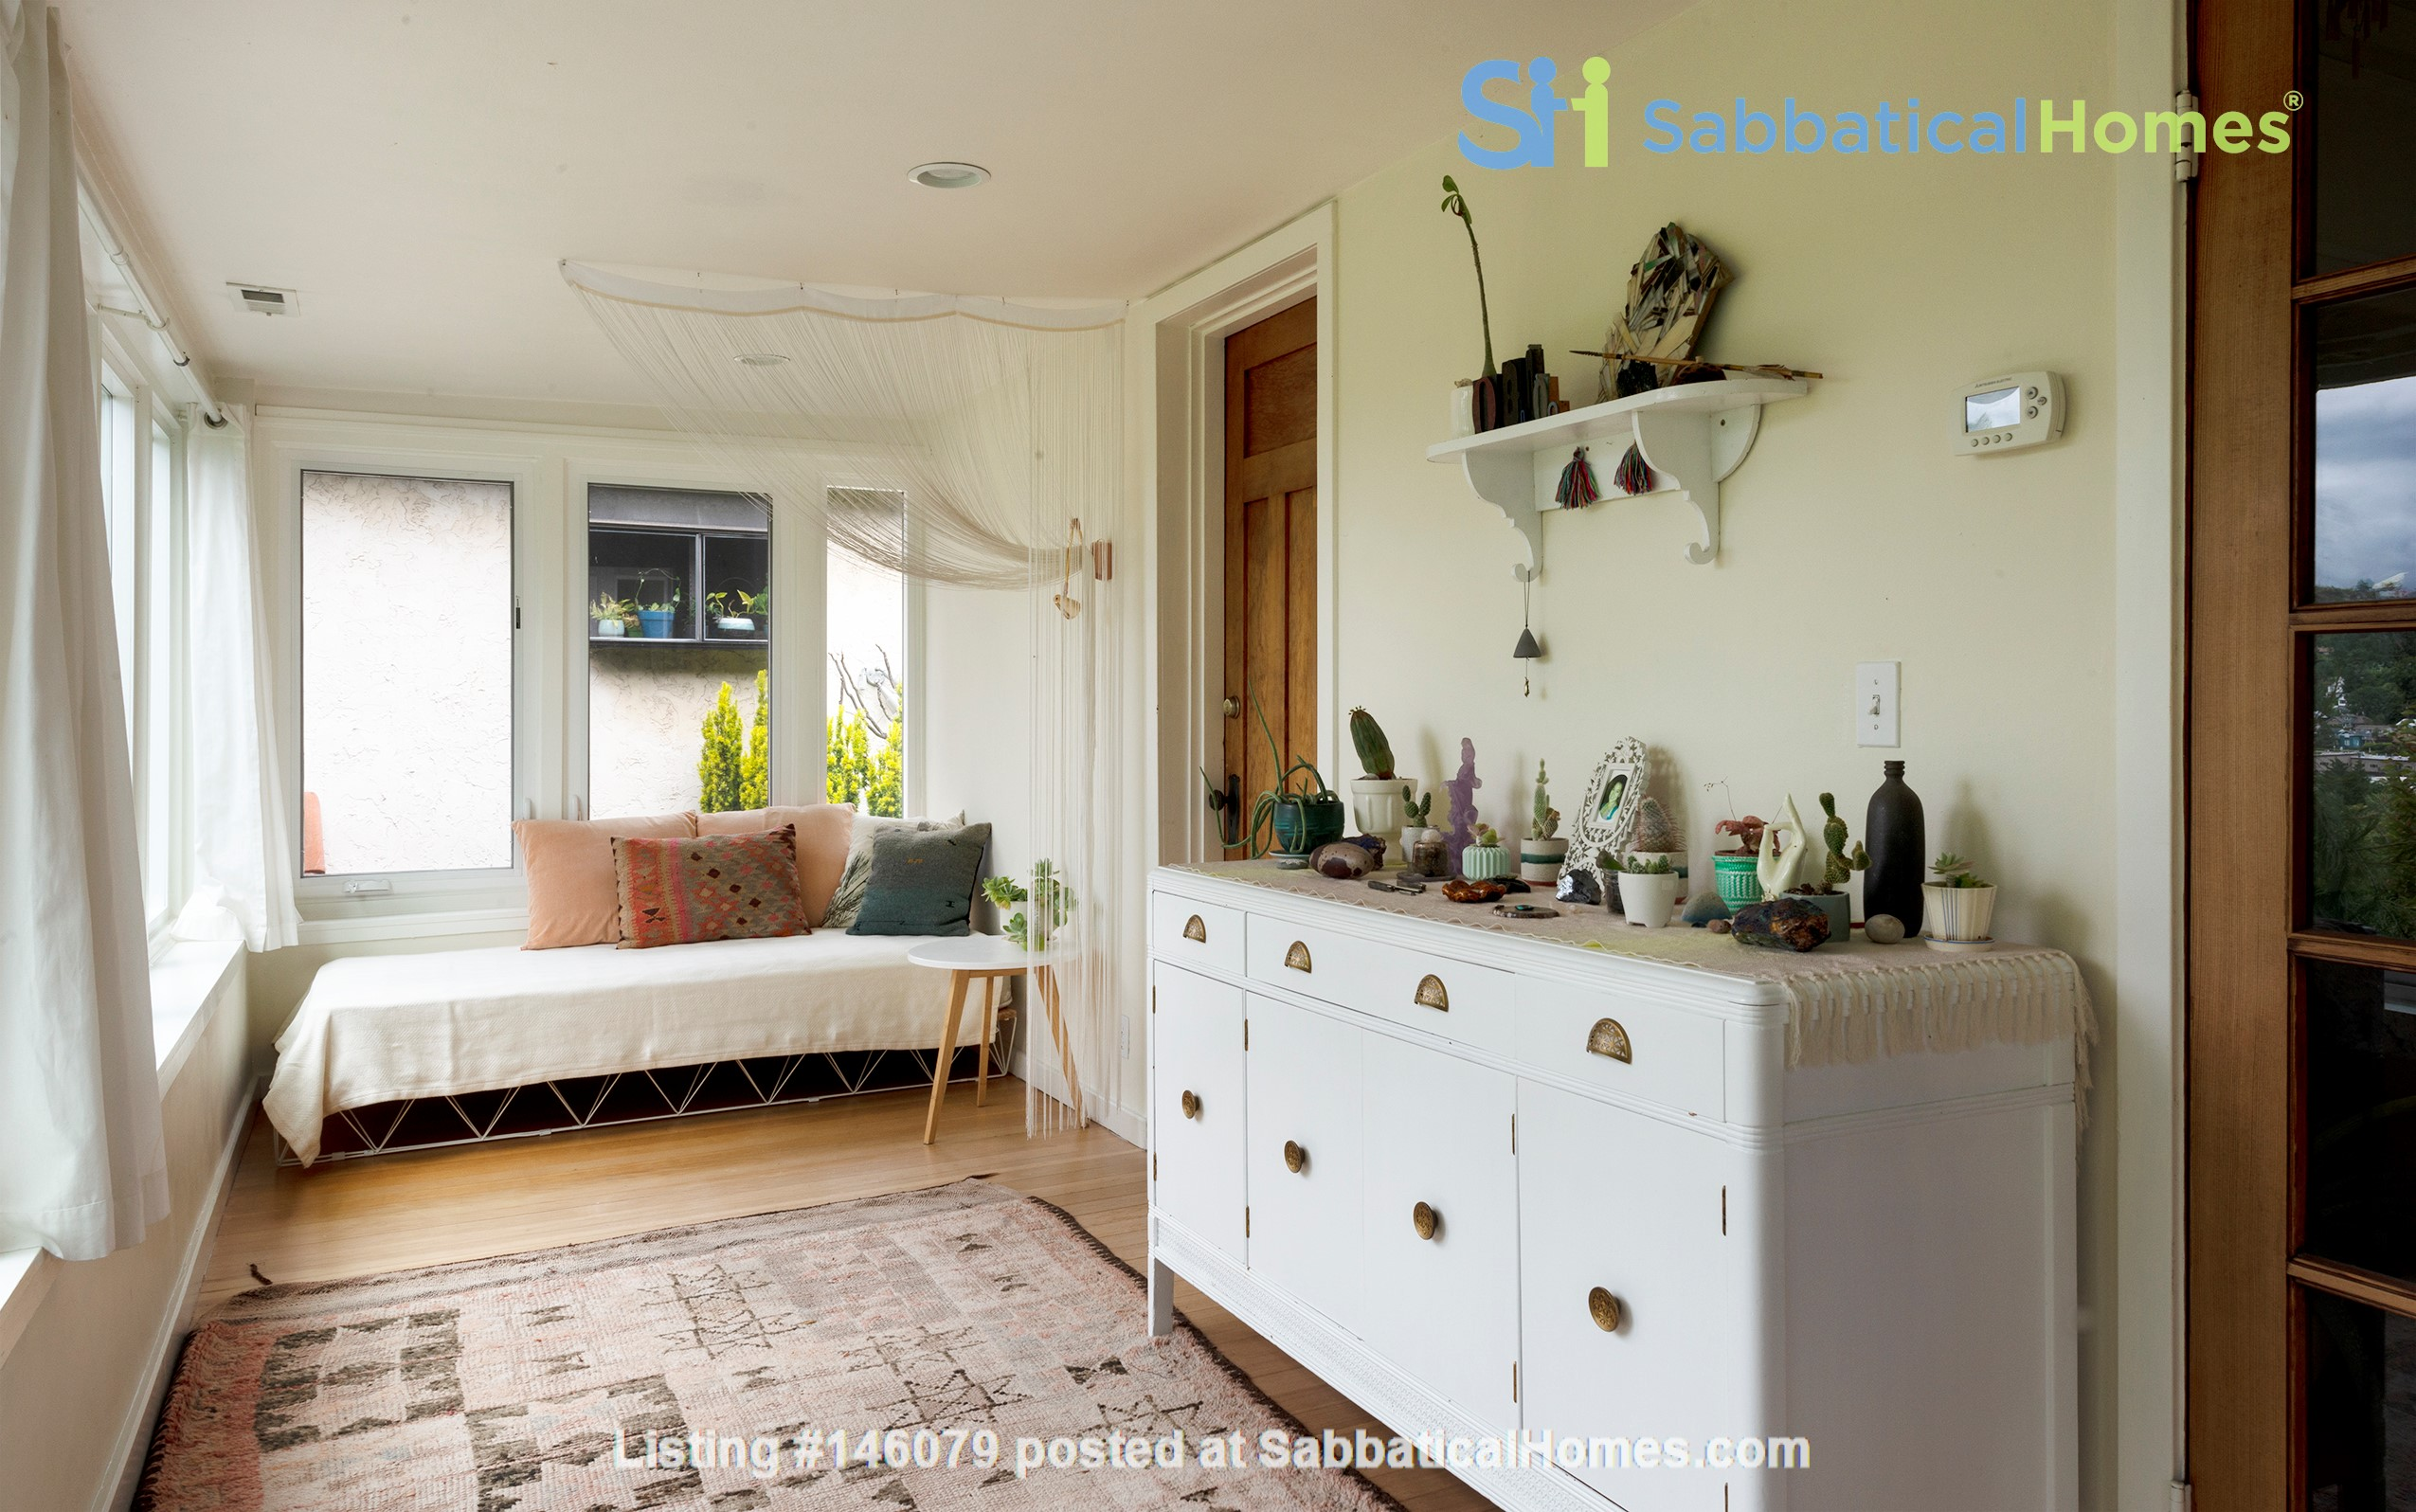 Scandinavian Queen Anne Home Home Rental in Seattle 6